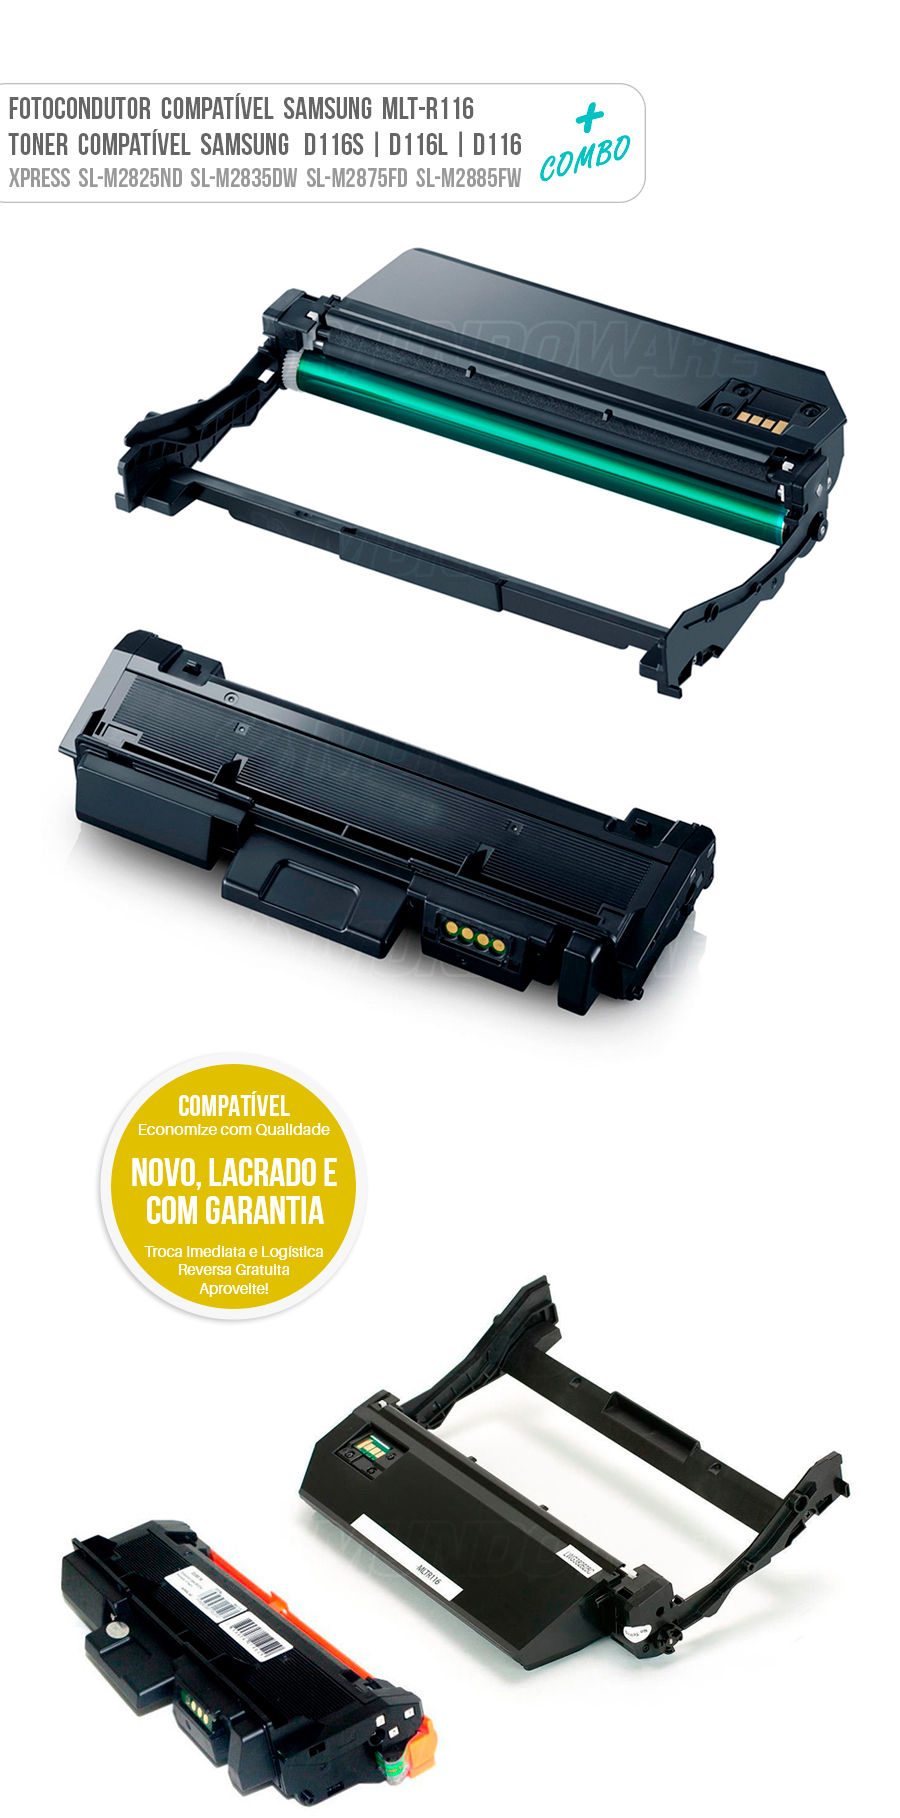 Drum Fotocondutor Tambor de Imagem Unidade Cilindro Kit DR e Toner Tonner Cartucho R116 D116